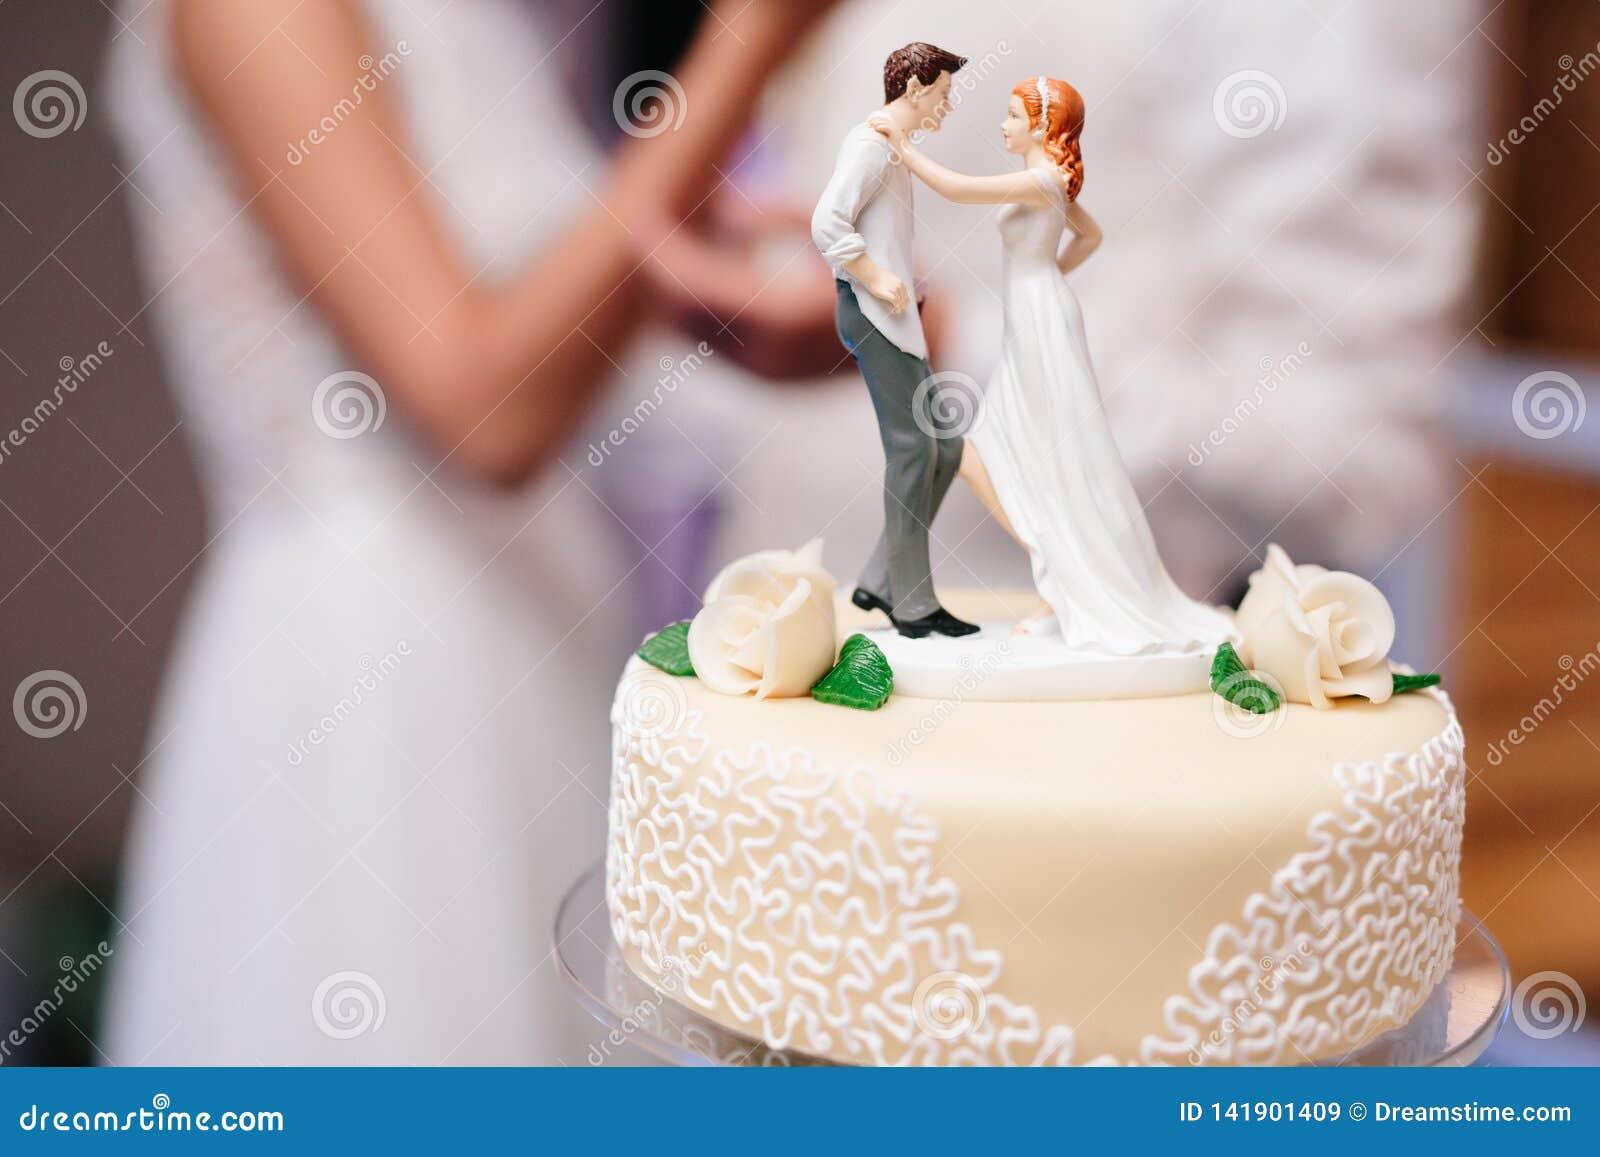 Bride and groom marzipan figures on the wedding cake